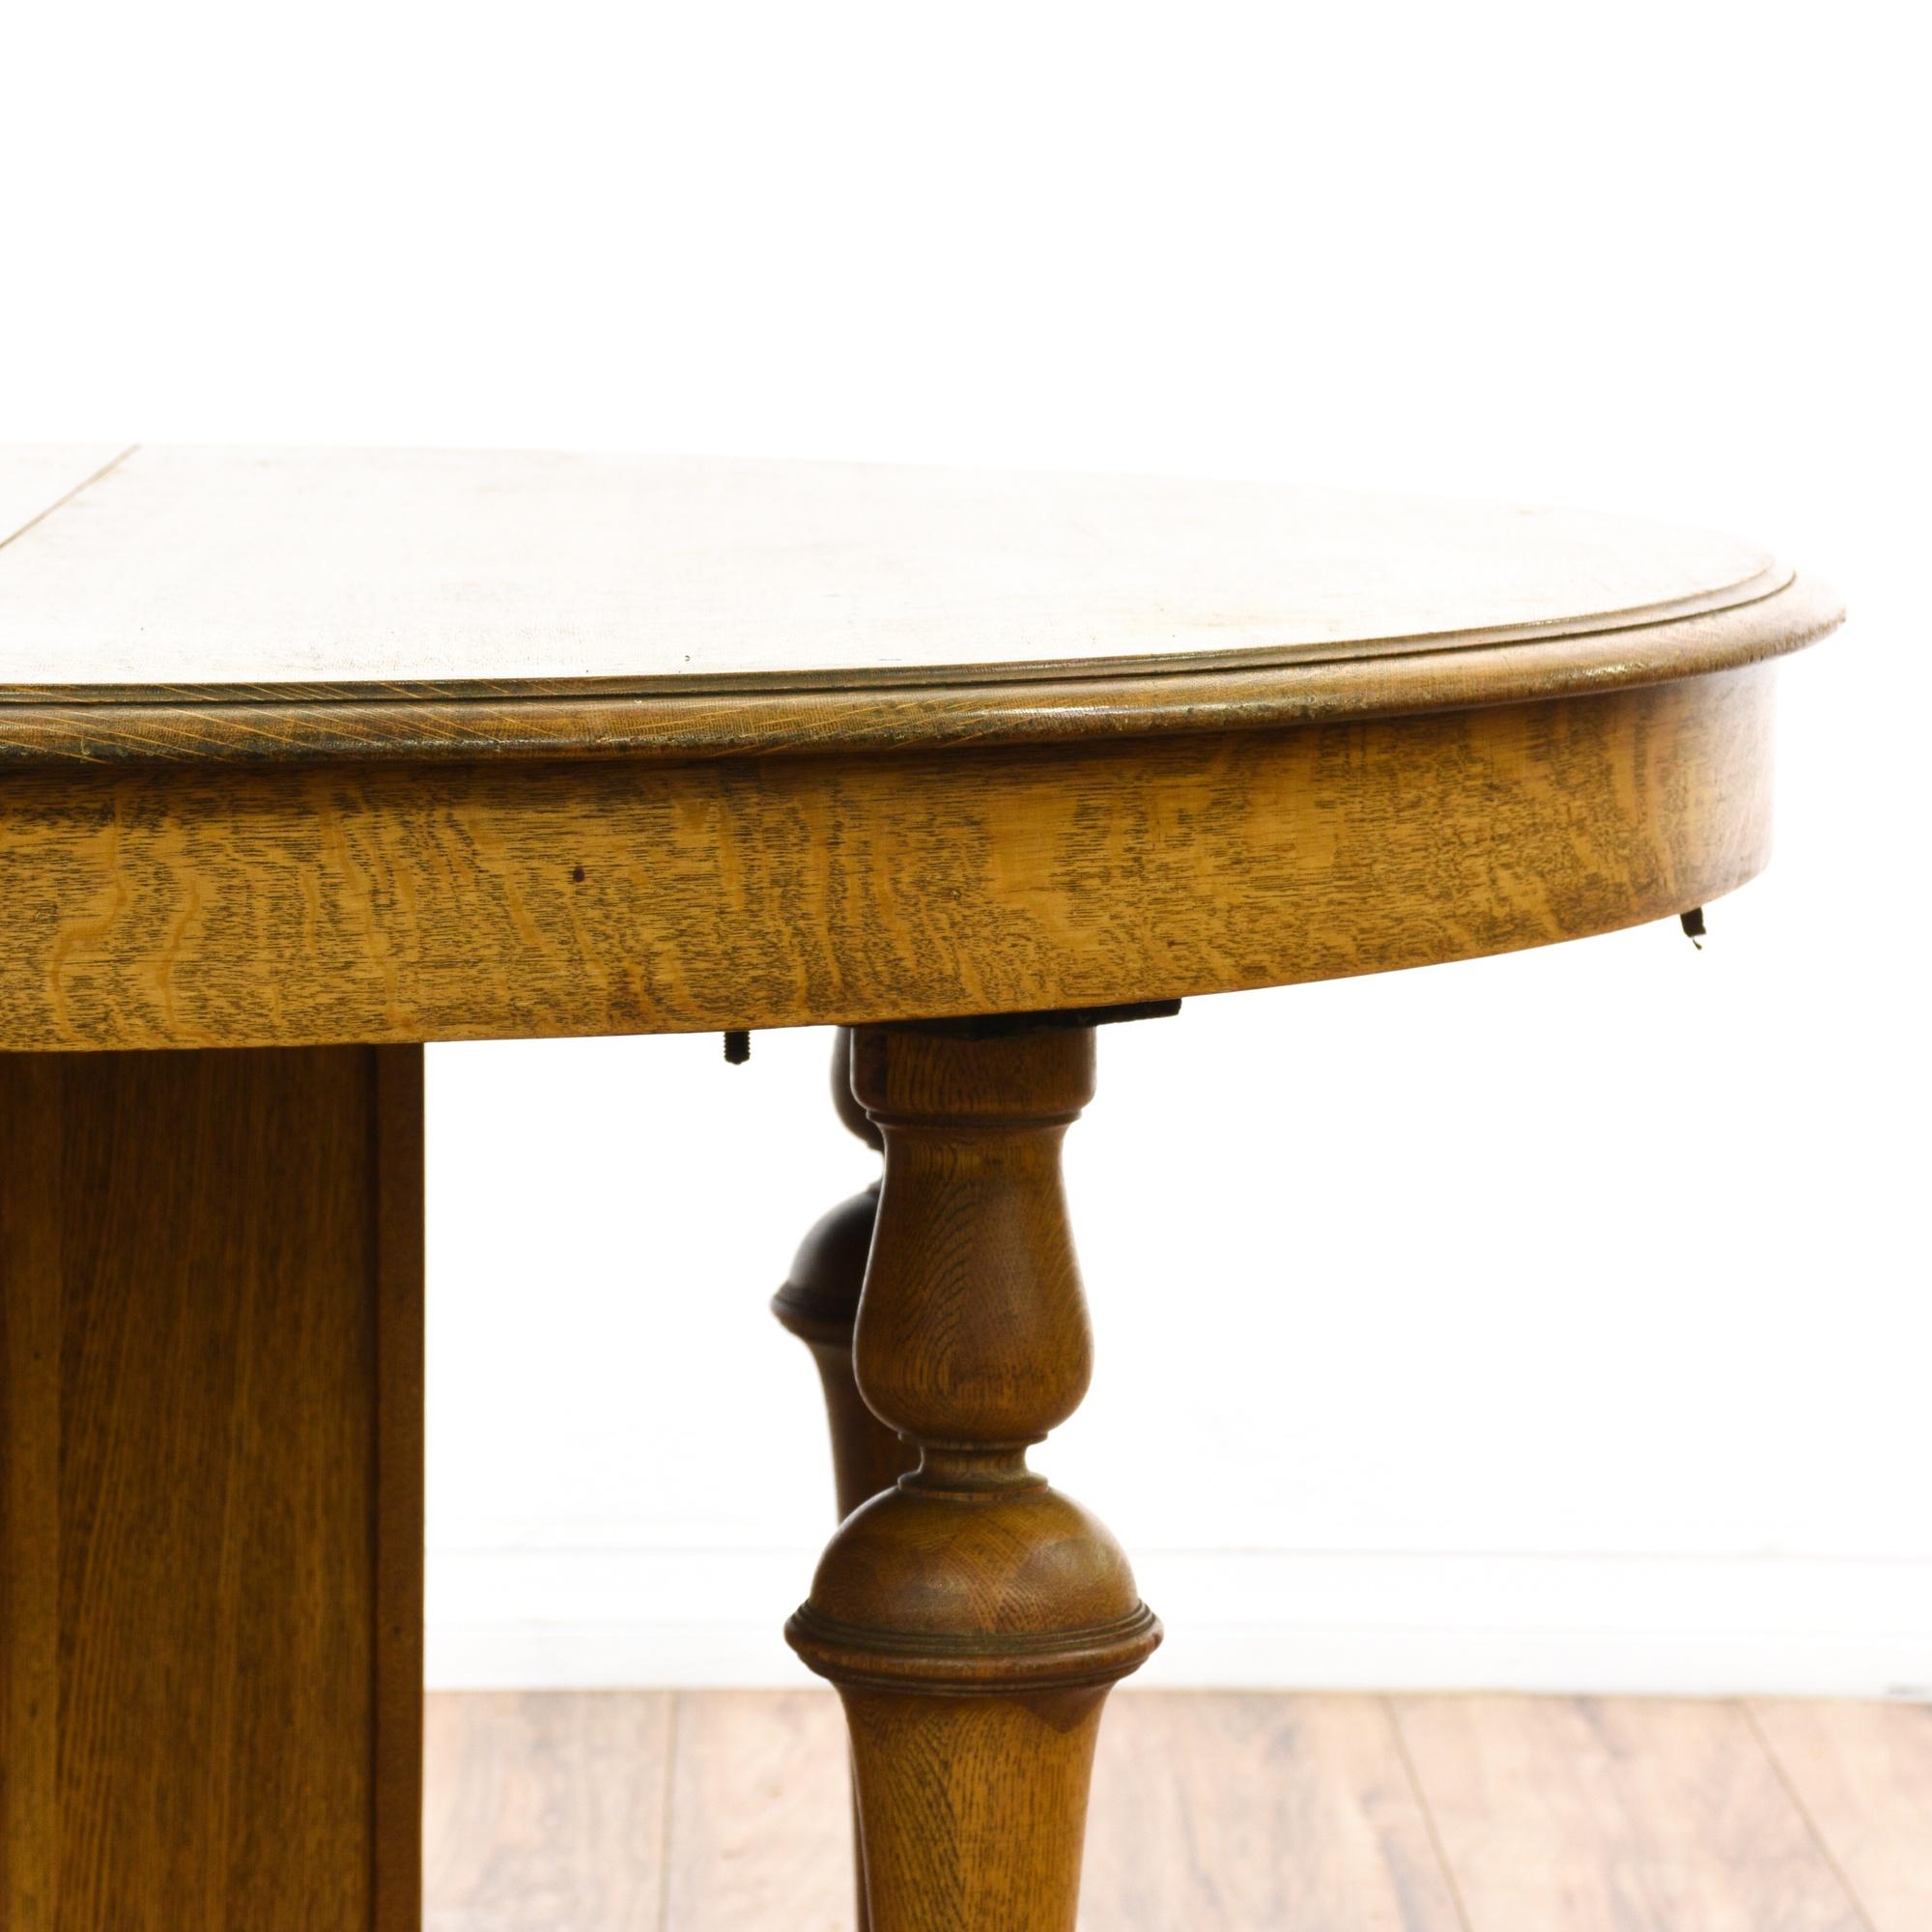 Round Turned Quarter Sawn Oak Dining Table Loveseat  : convertw2000amph2000ampfitcropamprotateexif from www.loveseat.com size 2000 x 2000 jpeg 249kB